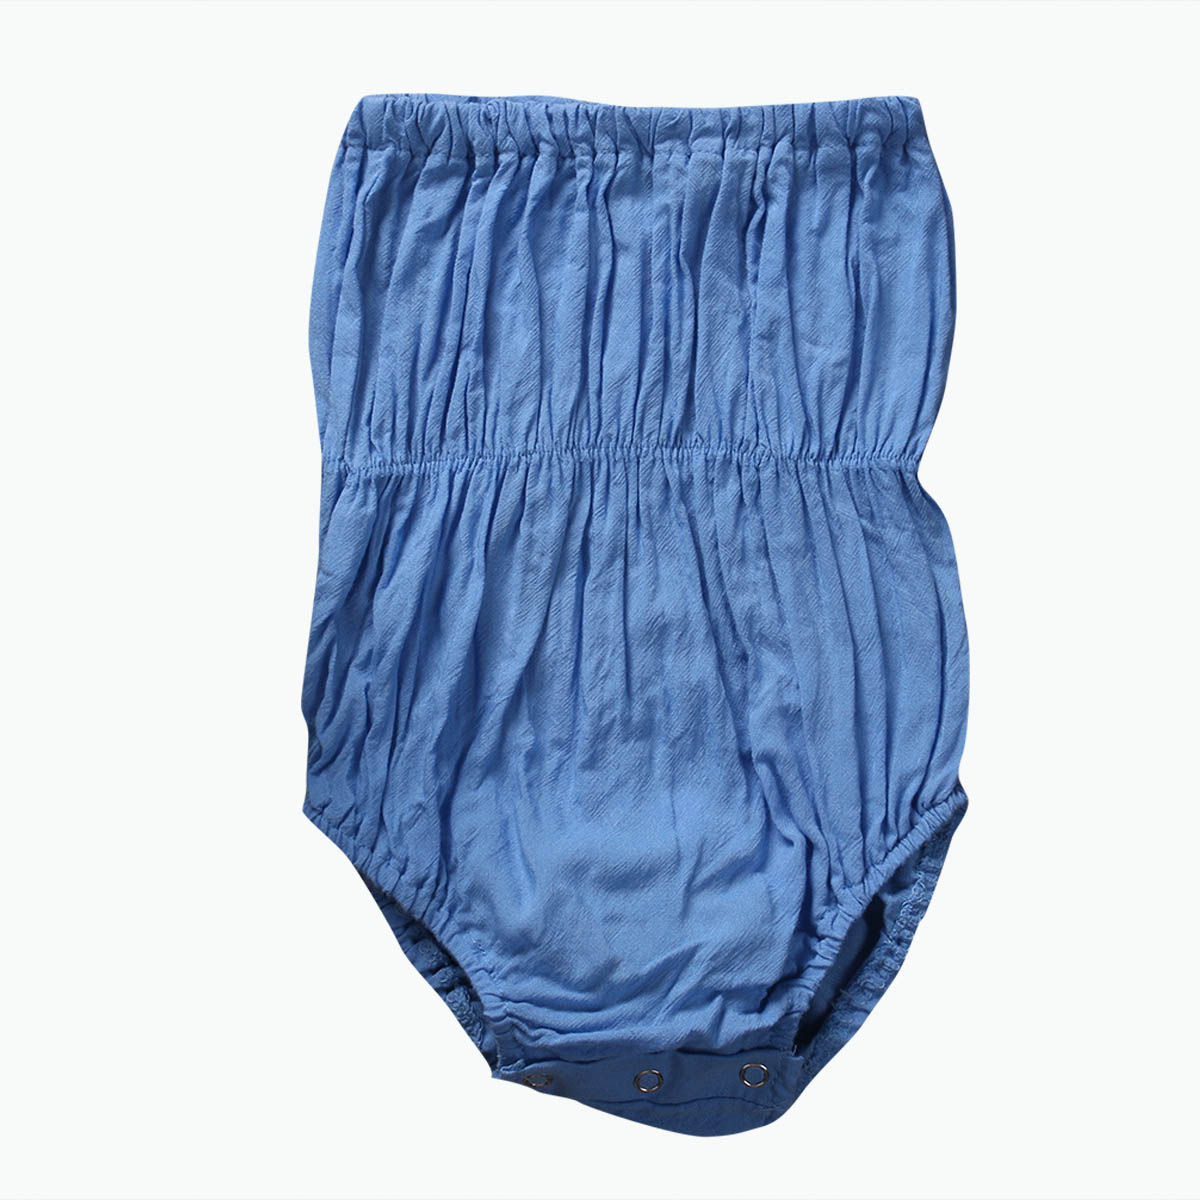 Summer 2017 Newborn Baby Girls Tube Top Denim Romper Kids Jumpsuit Outfits Sunsuit Clothes